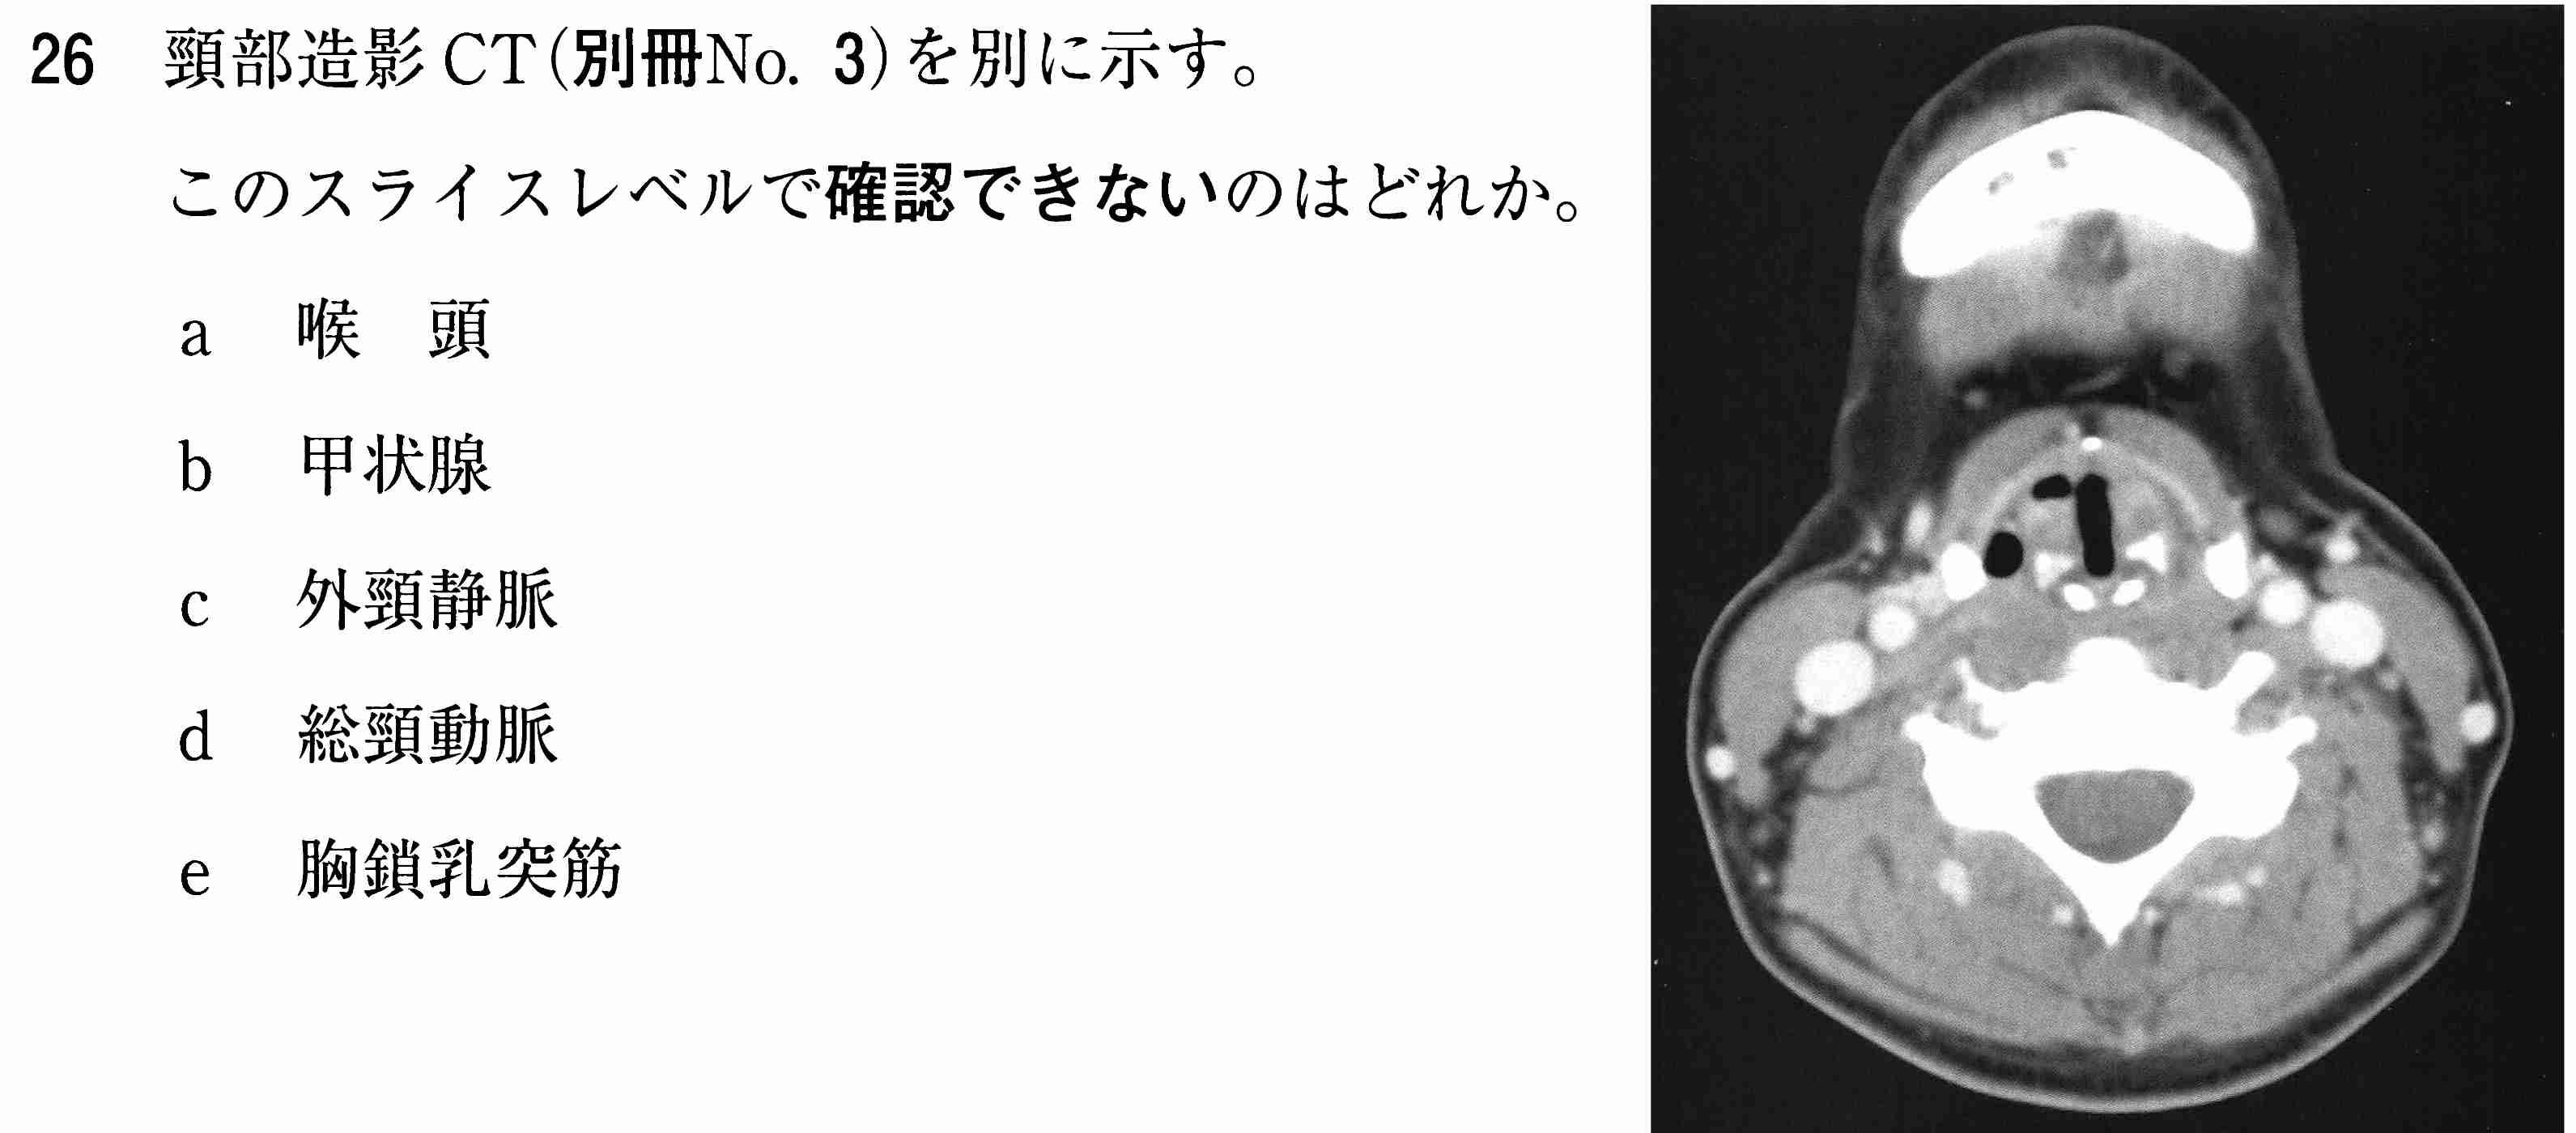 111G26.jpg